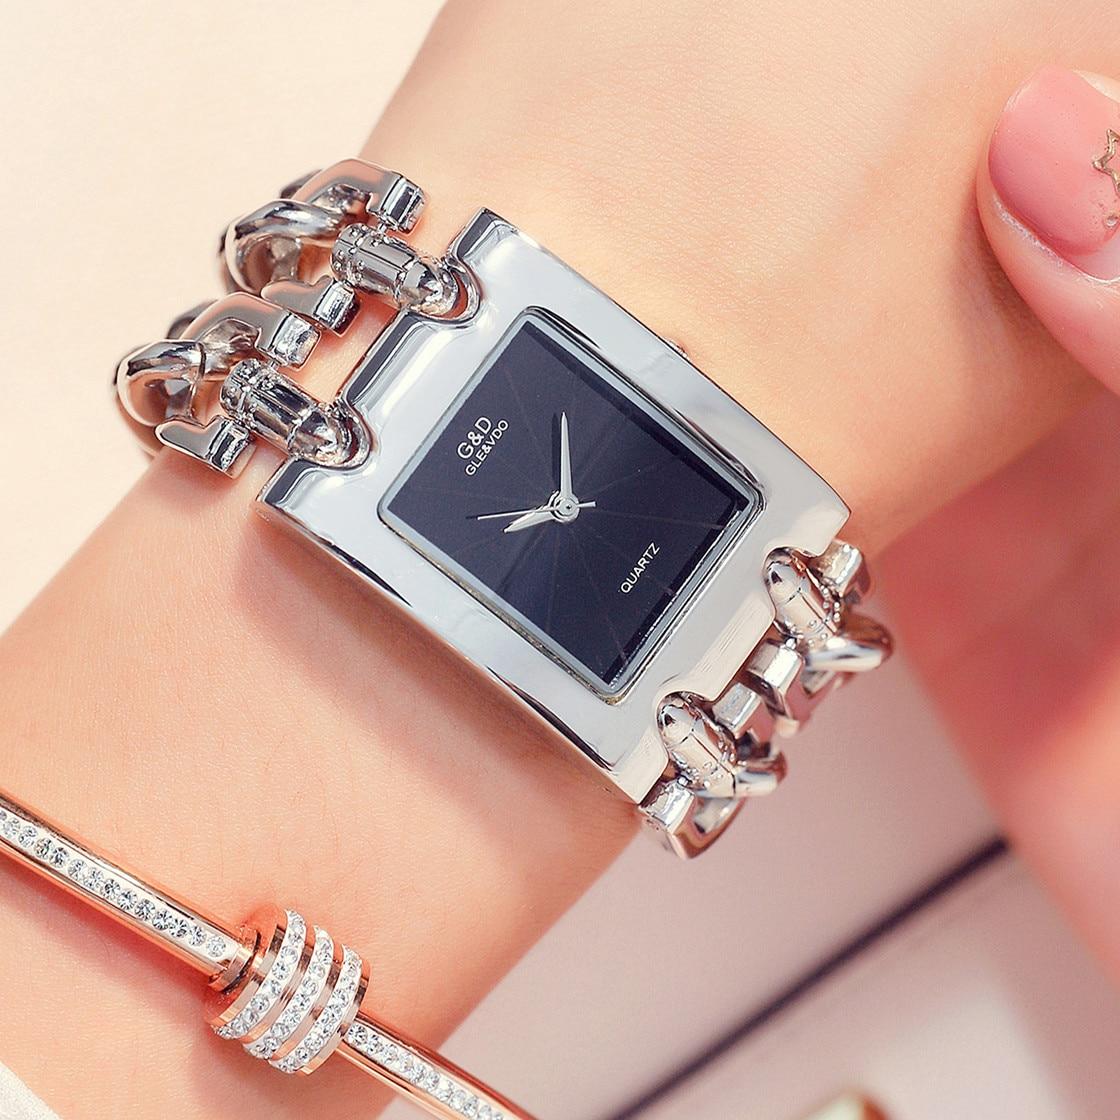 G&D Women Wrist Watches Silver Quartz Watches Relogio Feminino Reloj Mujer Ladies Watches Top Brand Luxury Clock Gift For Women